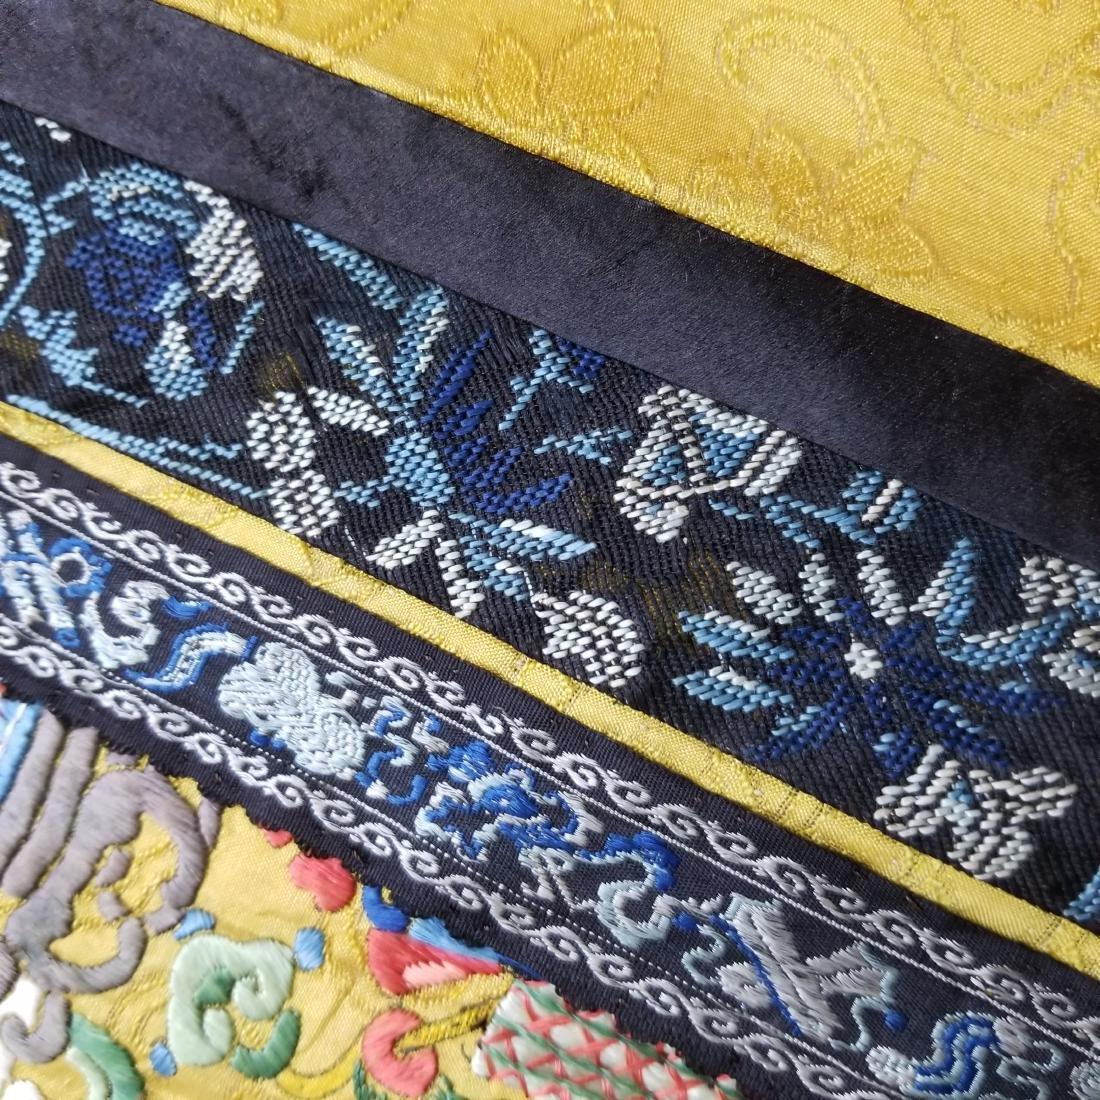 Antique Chinese Silk Hand Embroidered Skirt Forbidden - 6